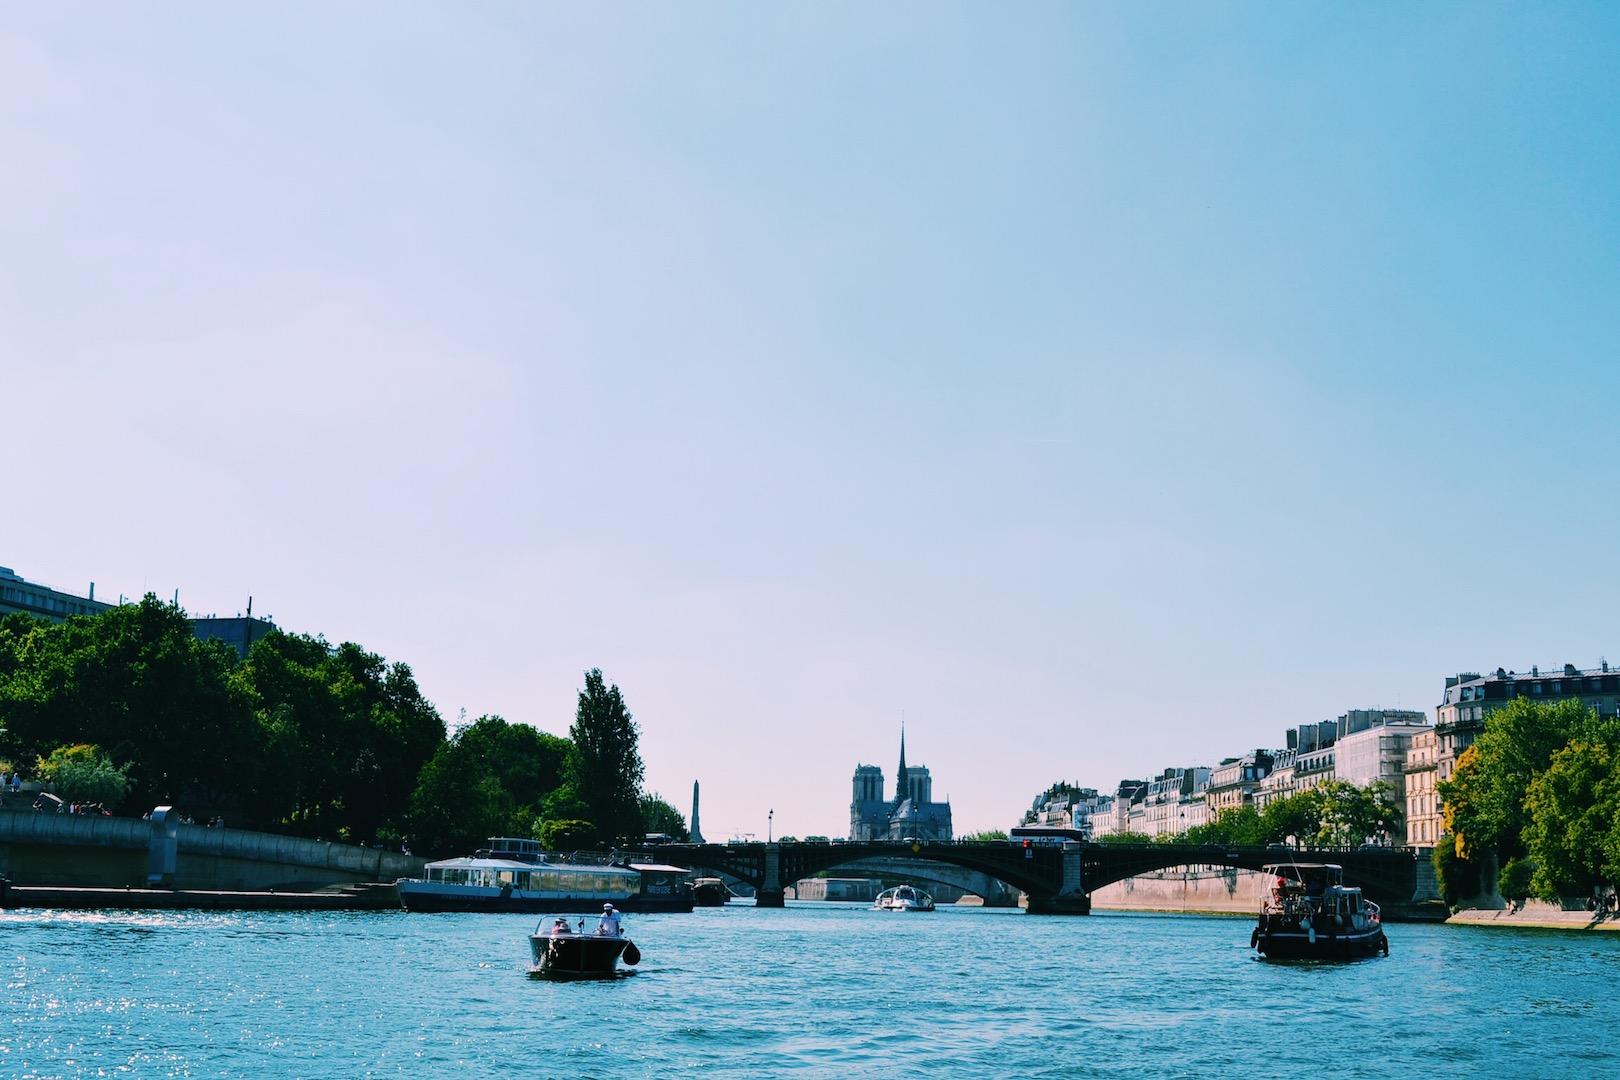 notre-dame-from-the-seine-river-paris.JPG